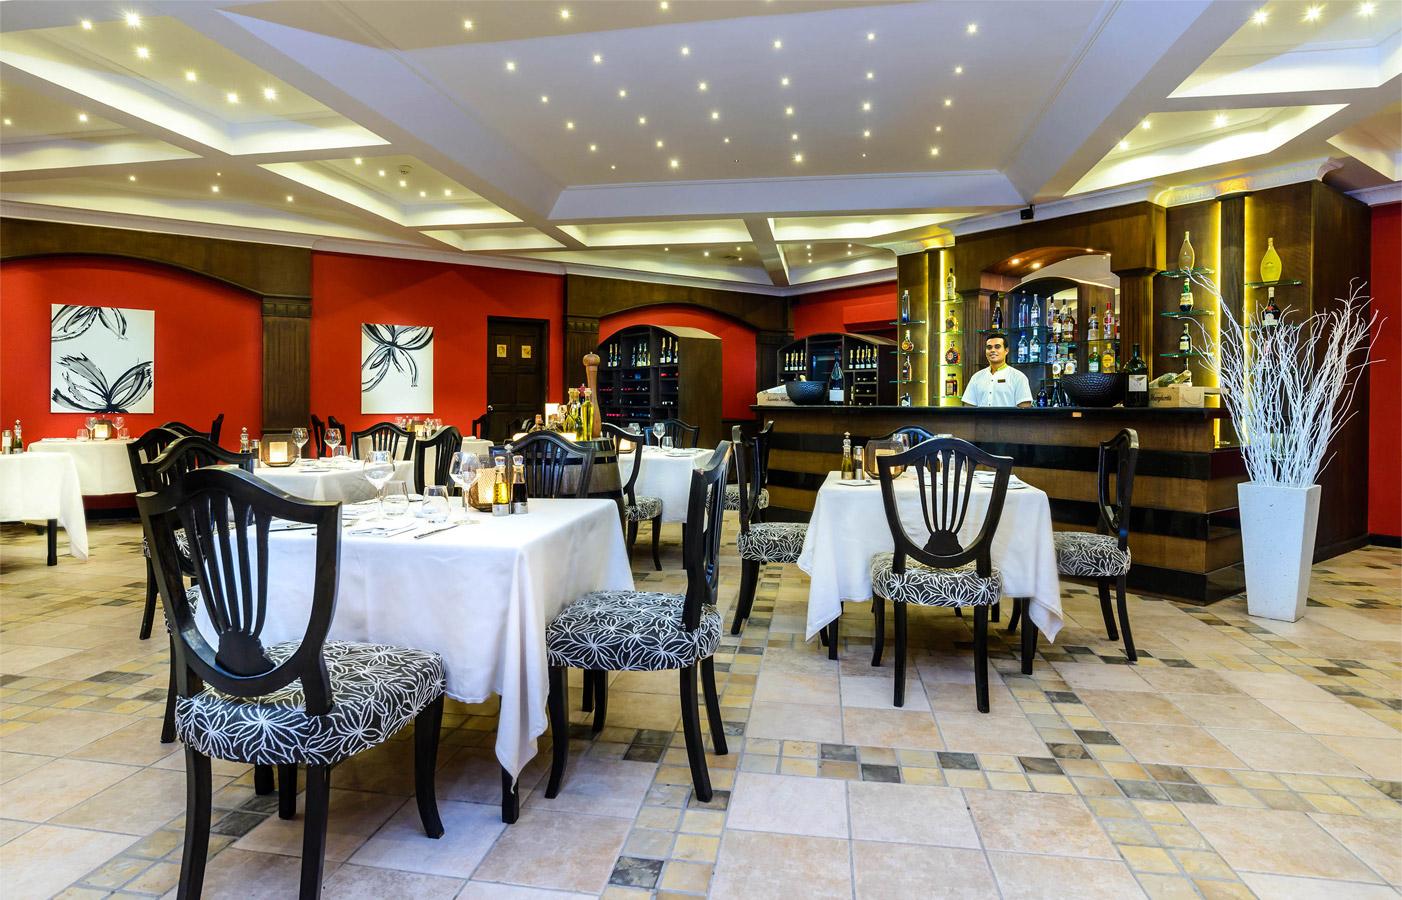 Isola Italian Restaurant Image | Kurumba Maldives Resort